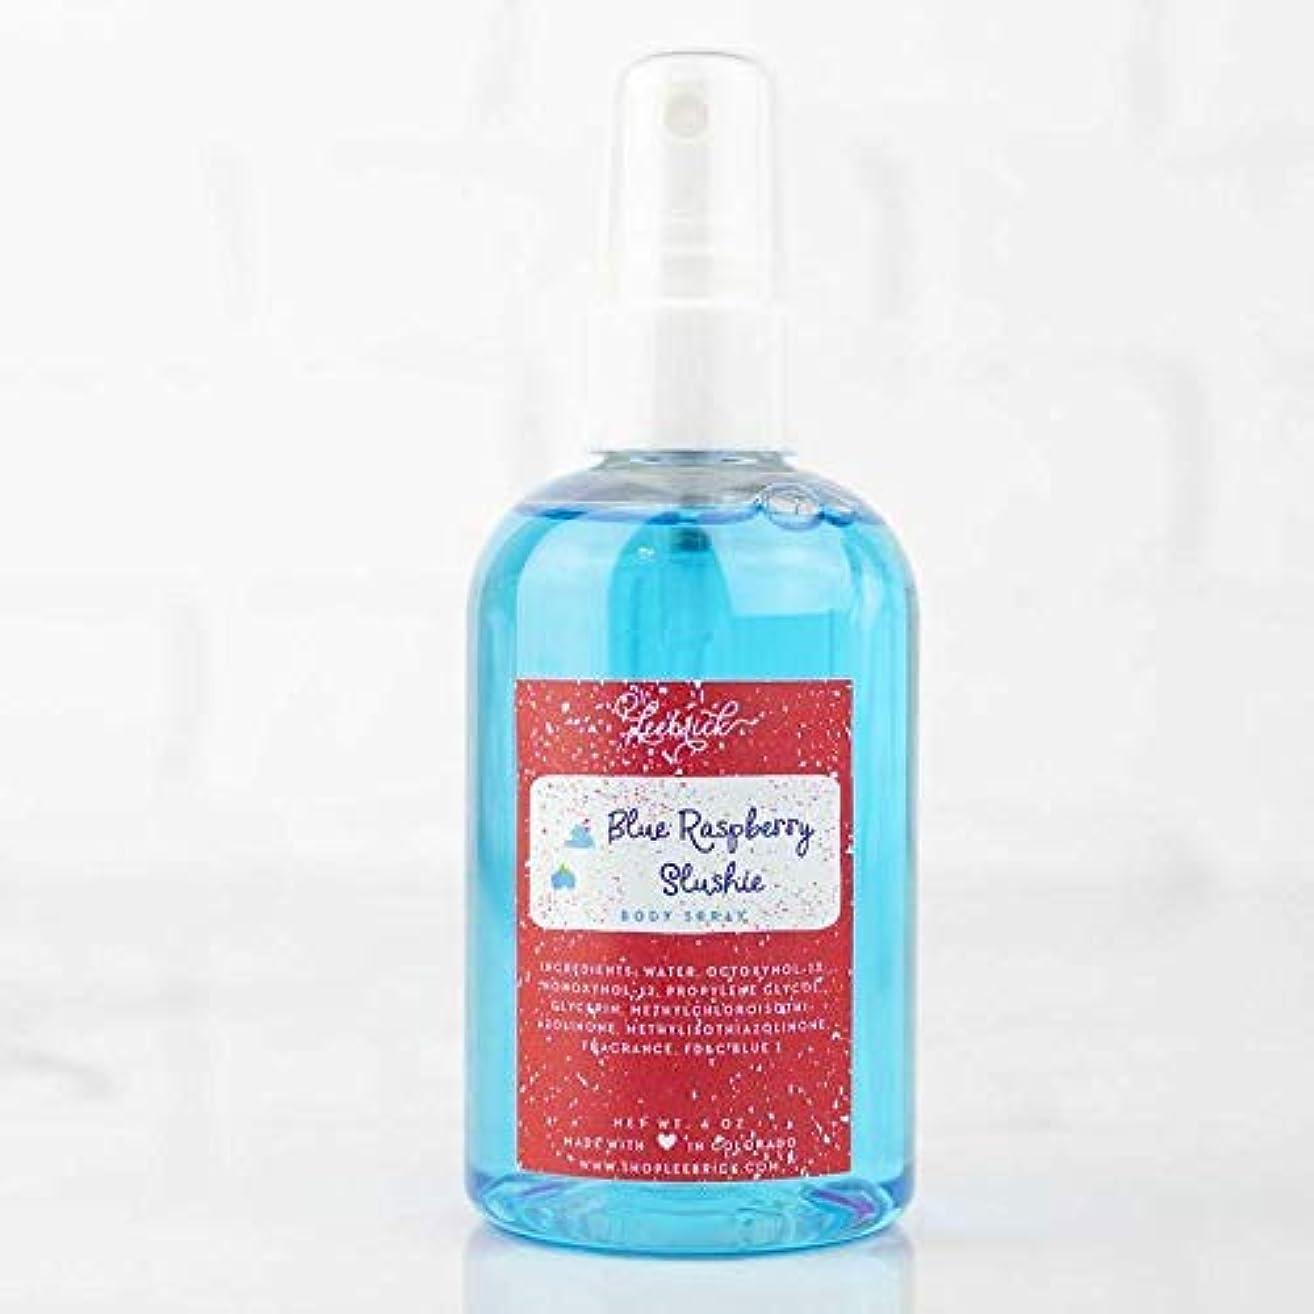 Blue Raspberry Slushie Scented Moisturizing Body Spray Oil for Women - 4 oz